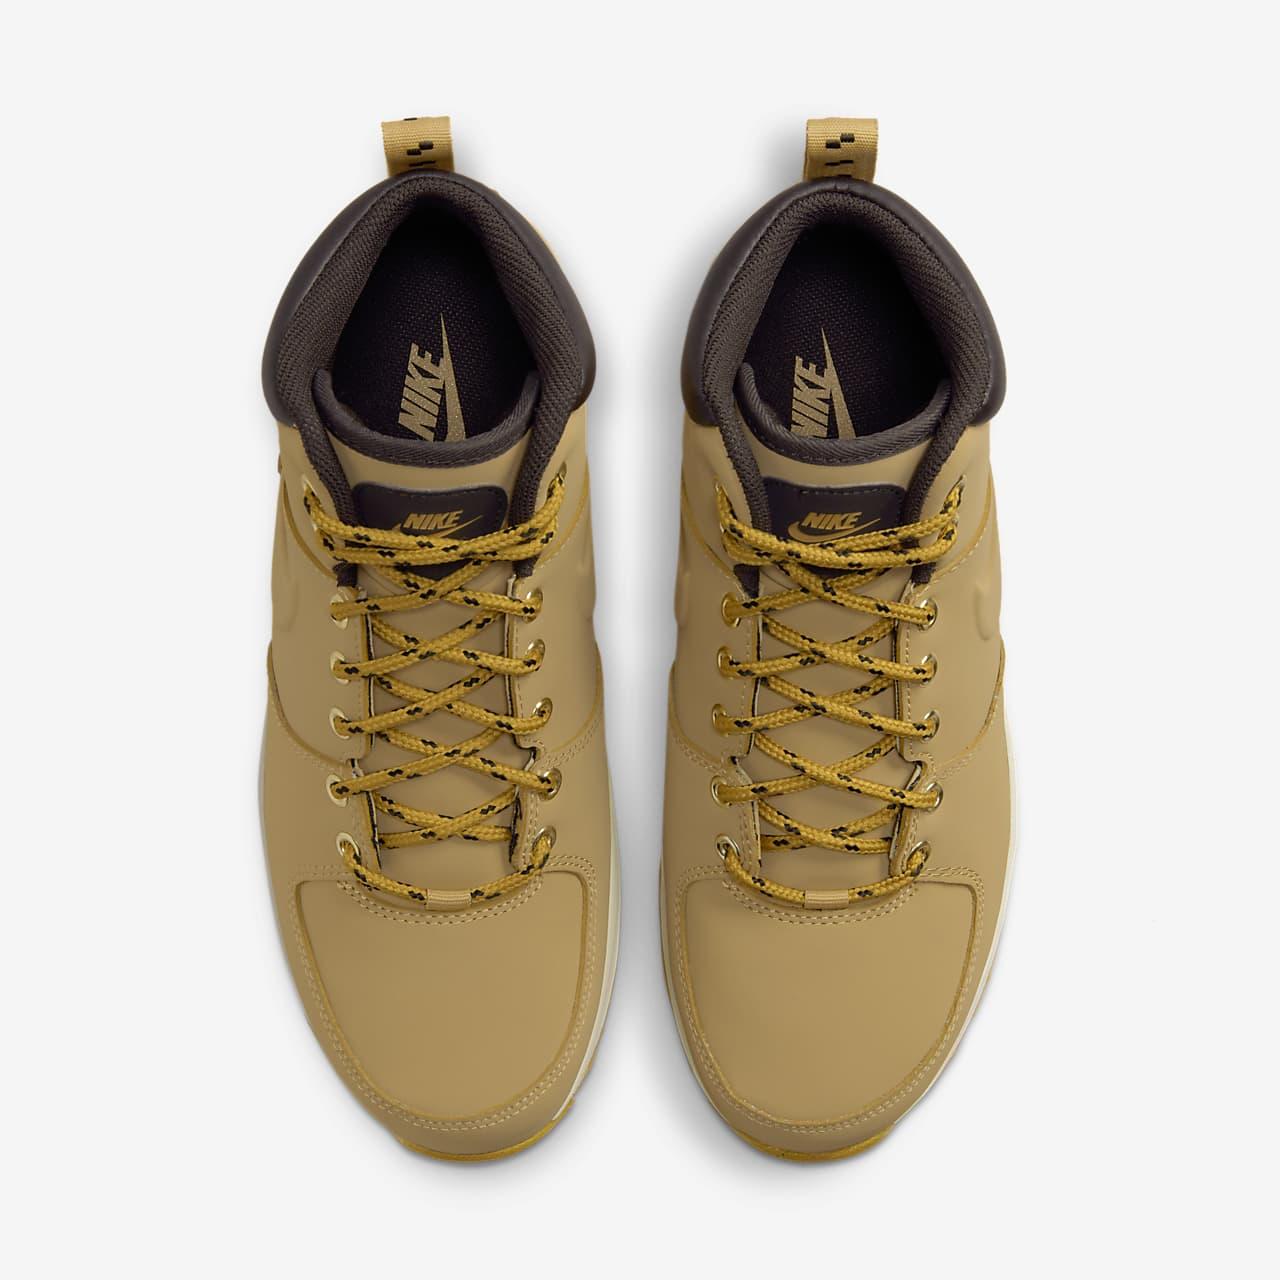 best website 59b1e 8c7d2 Low Resolution Nike Manoa Men s Boot Nike Manoa Men s Boot